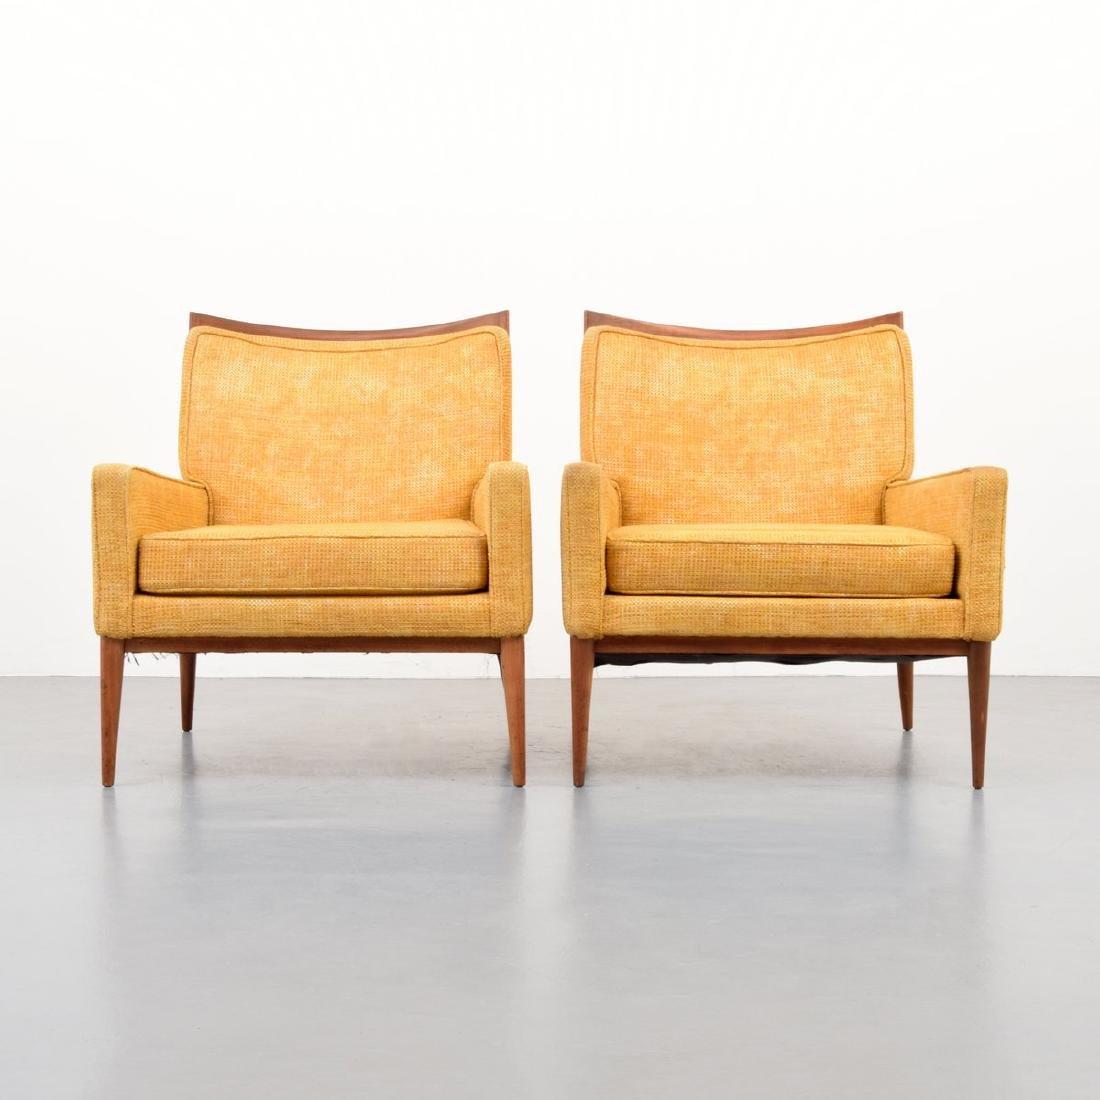 Pair of Paul McCobb Lounge Chairs - 2